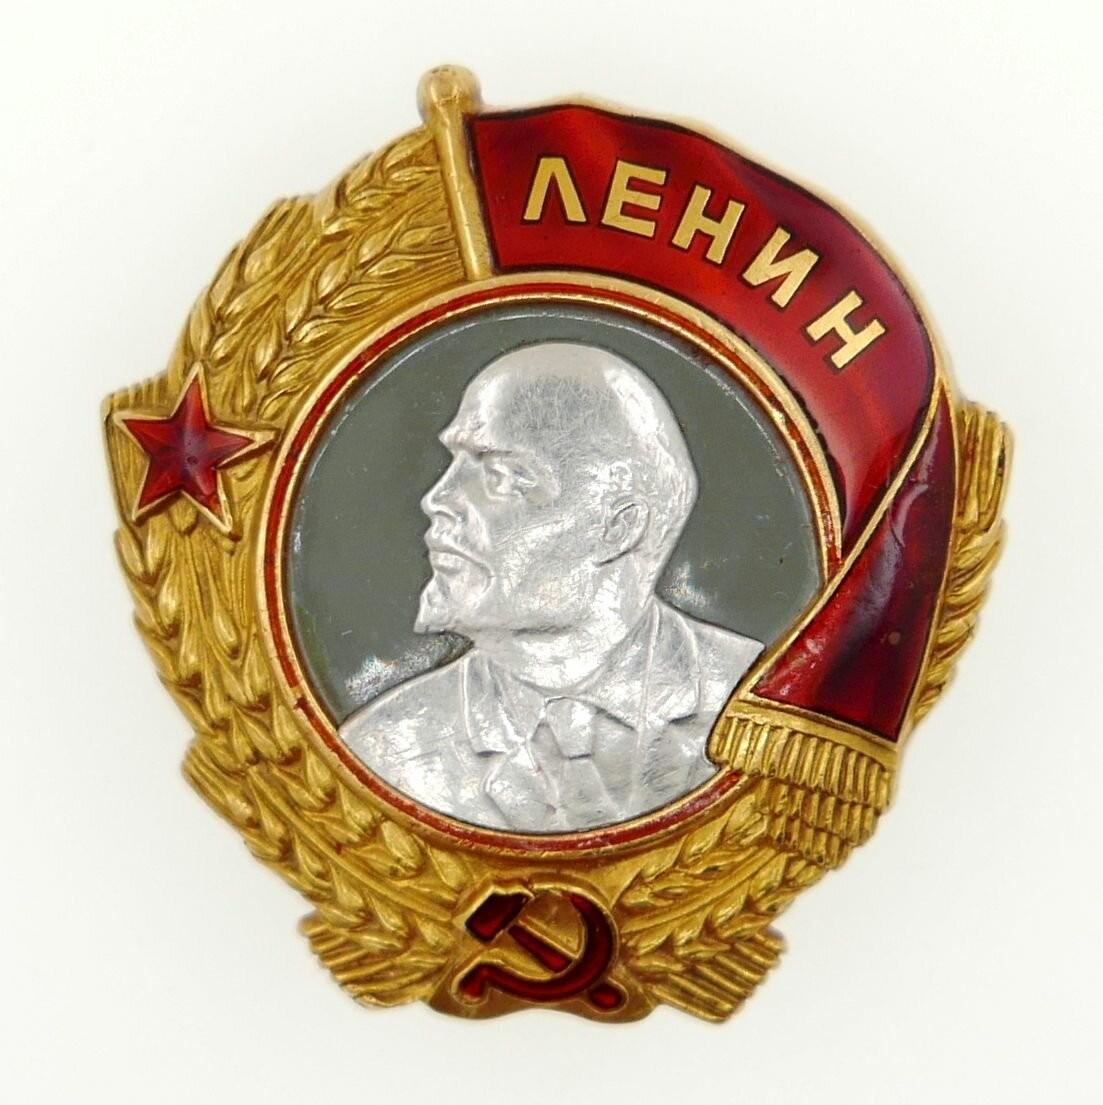 На КБМ отмечают 45-летие со дня получения ордена Ленина